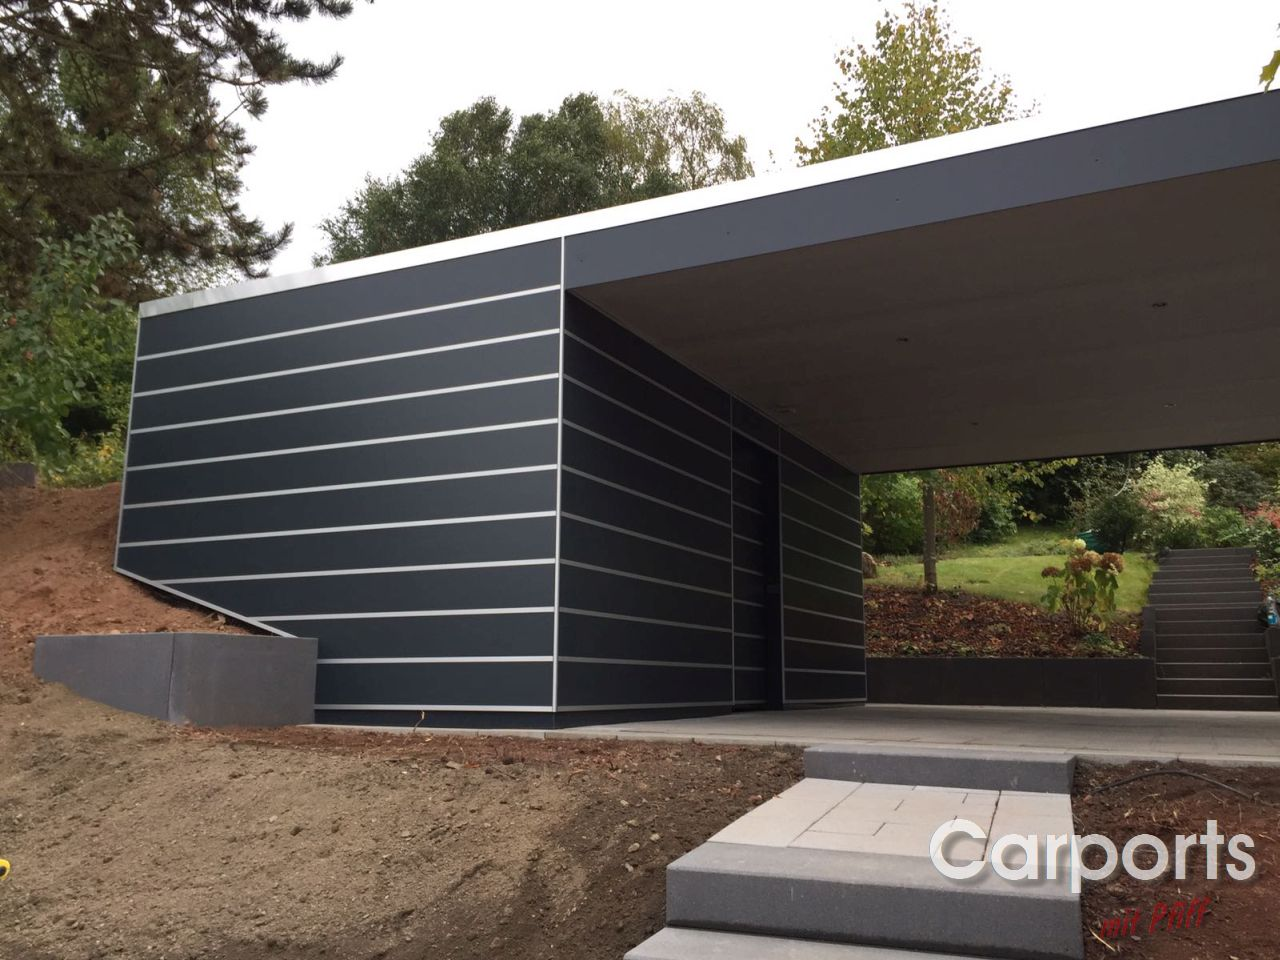 carport bauhaus trespa mit abstellraum carports mit pfiff. Black Bedroom Furniture Sets. Home Design Ideas